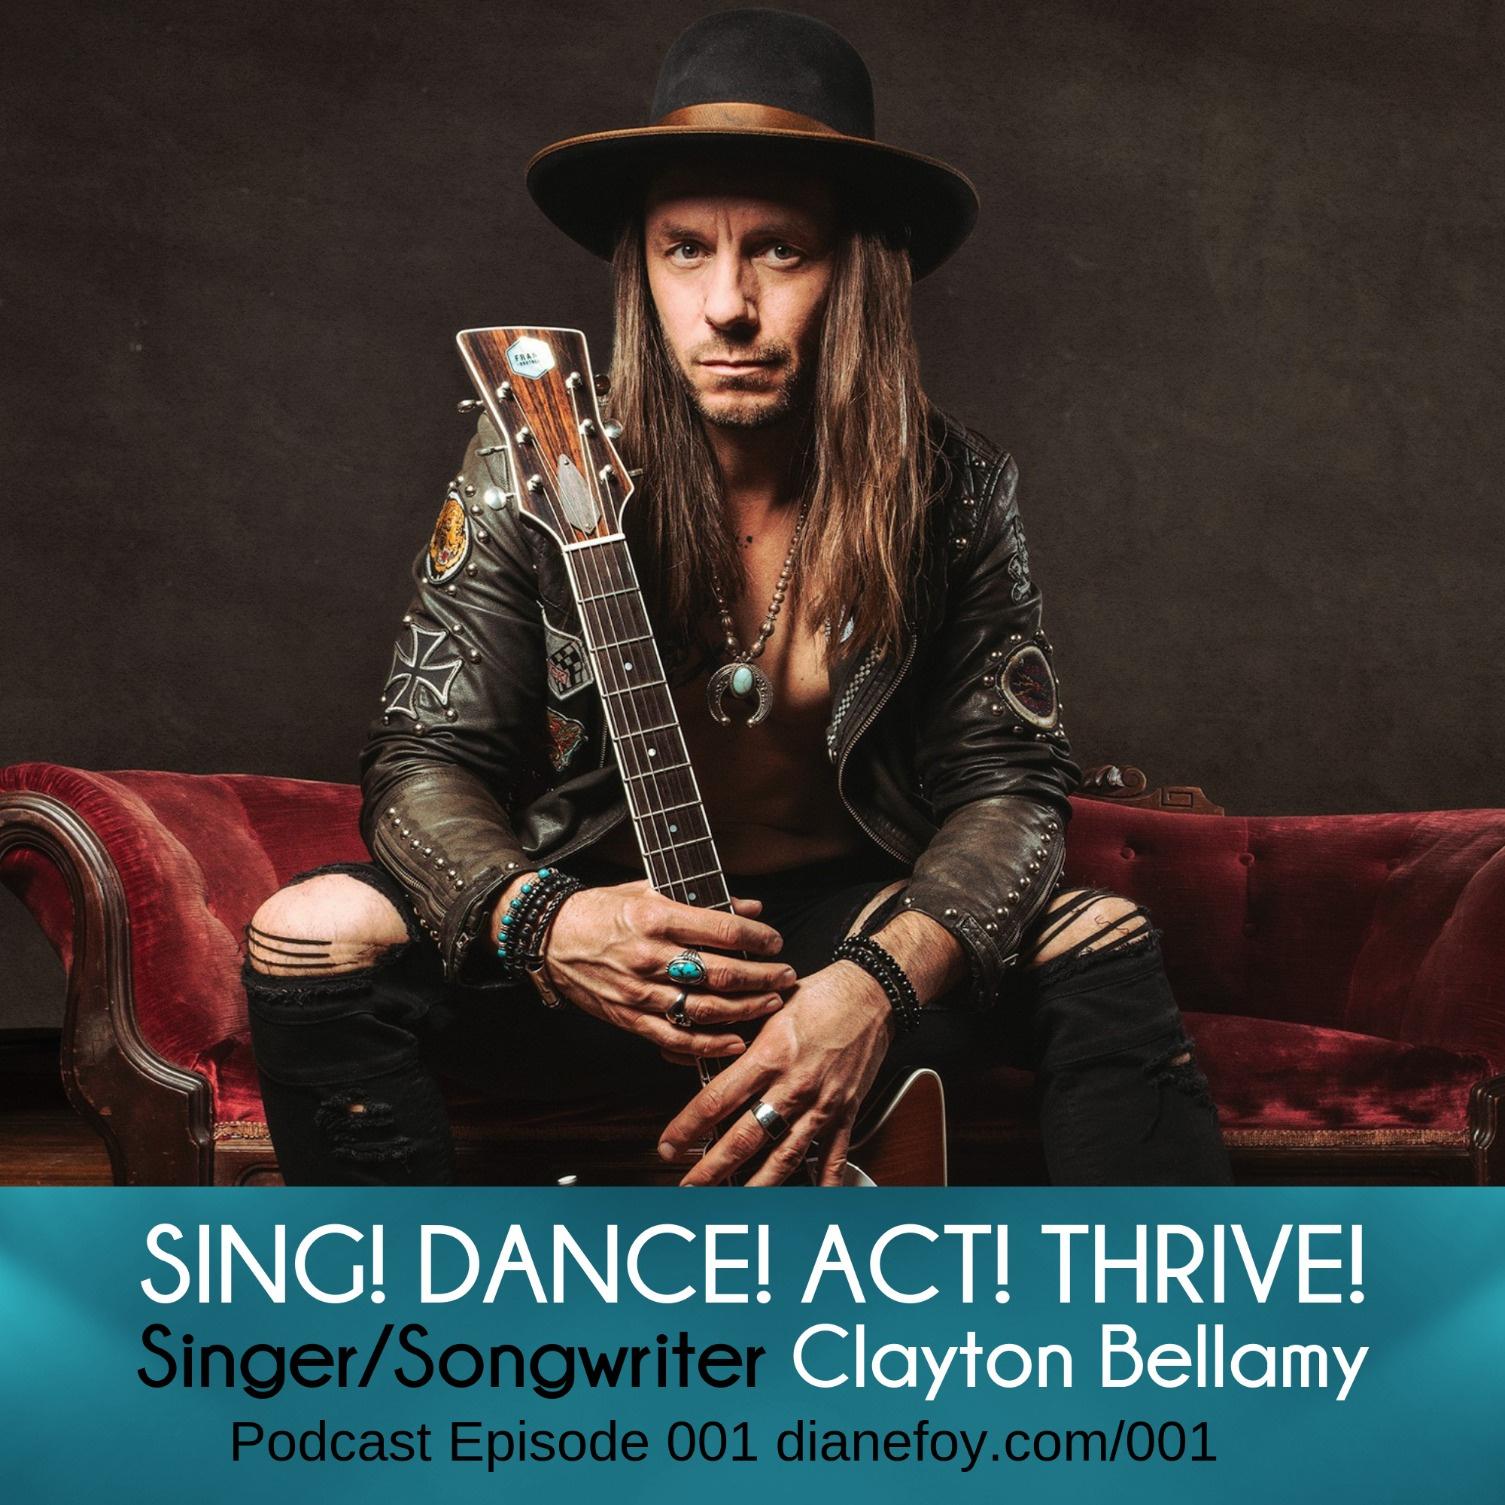 Clayton Bellamy, Musician